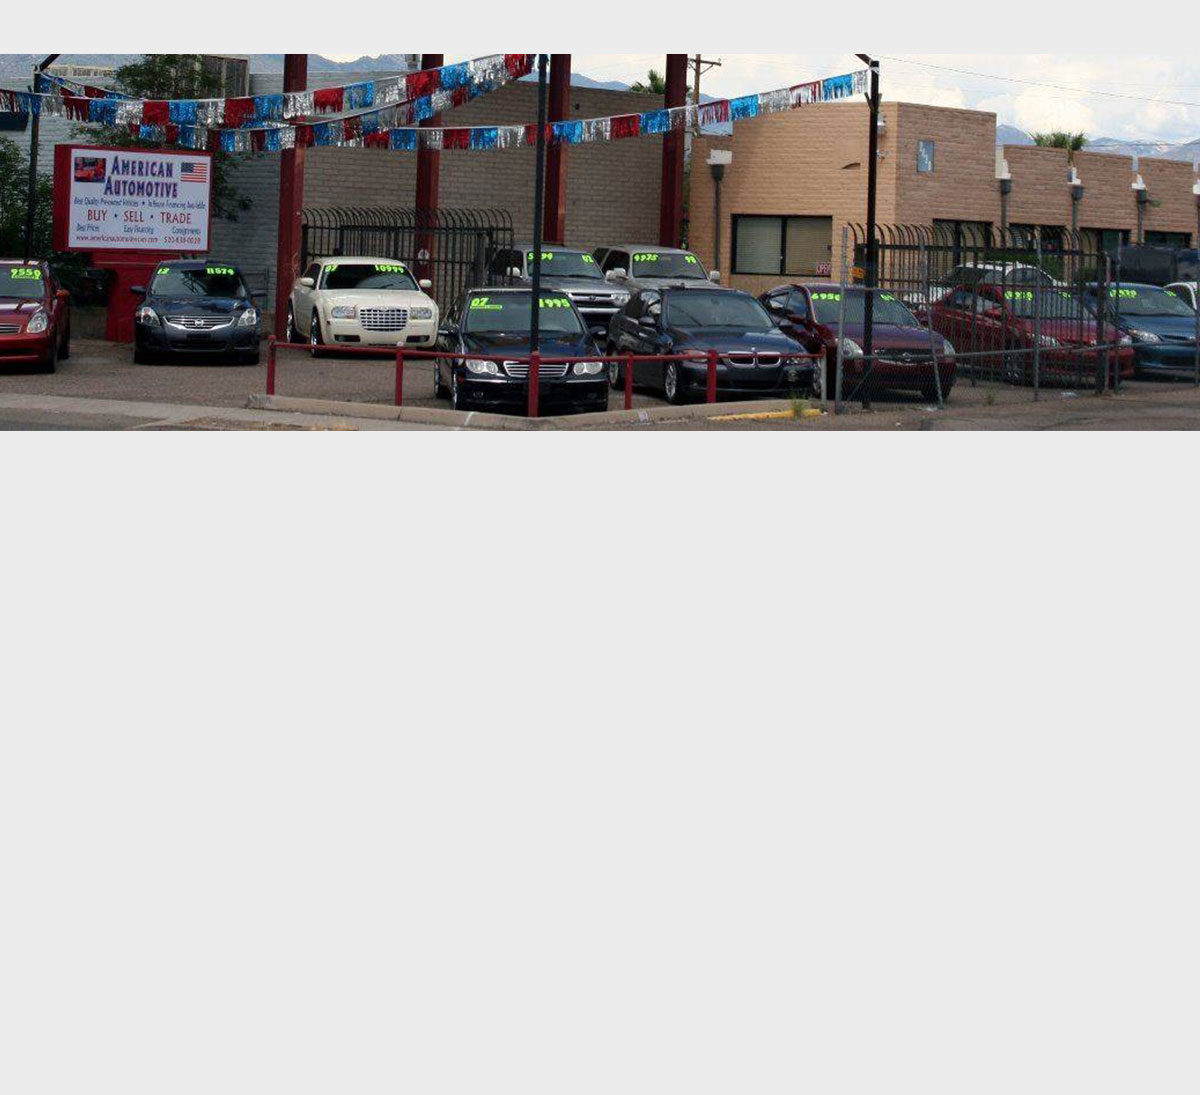 American Automotive LLC - Used Cars - Tucson AZ Dealer